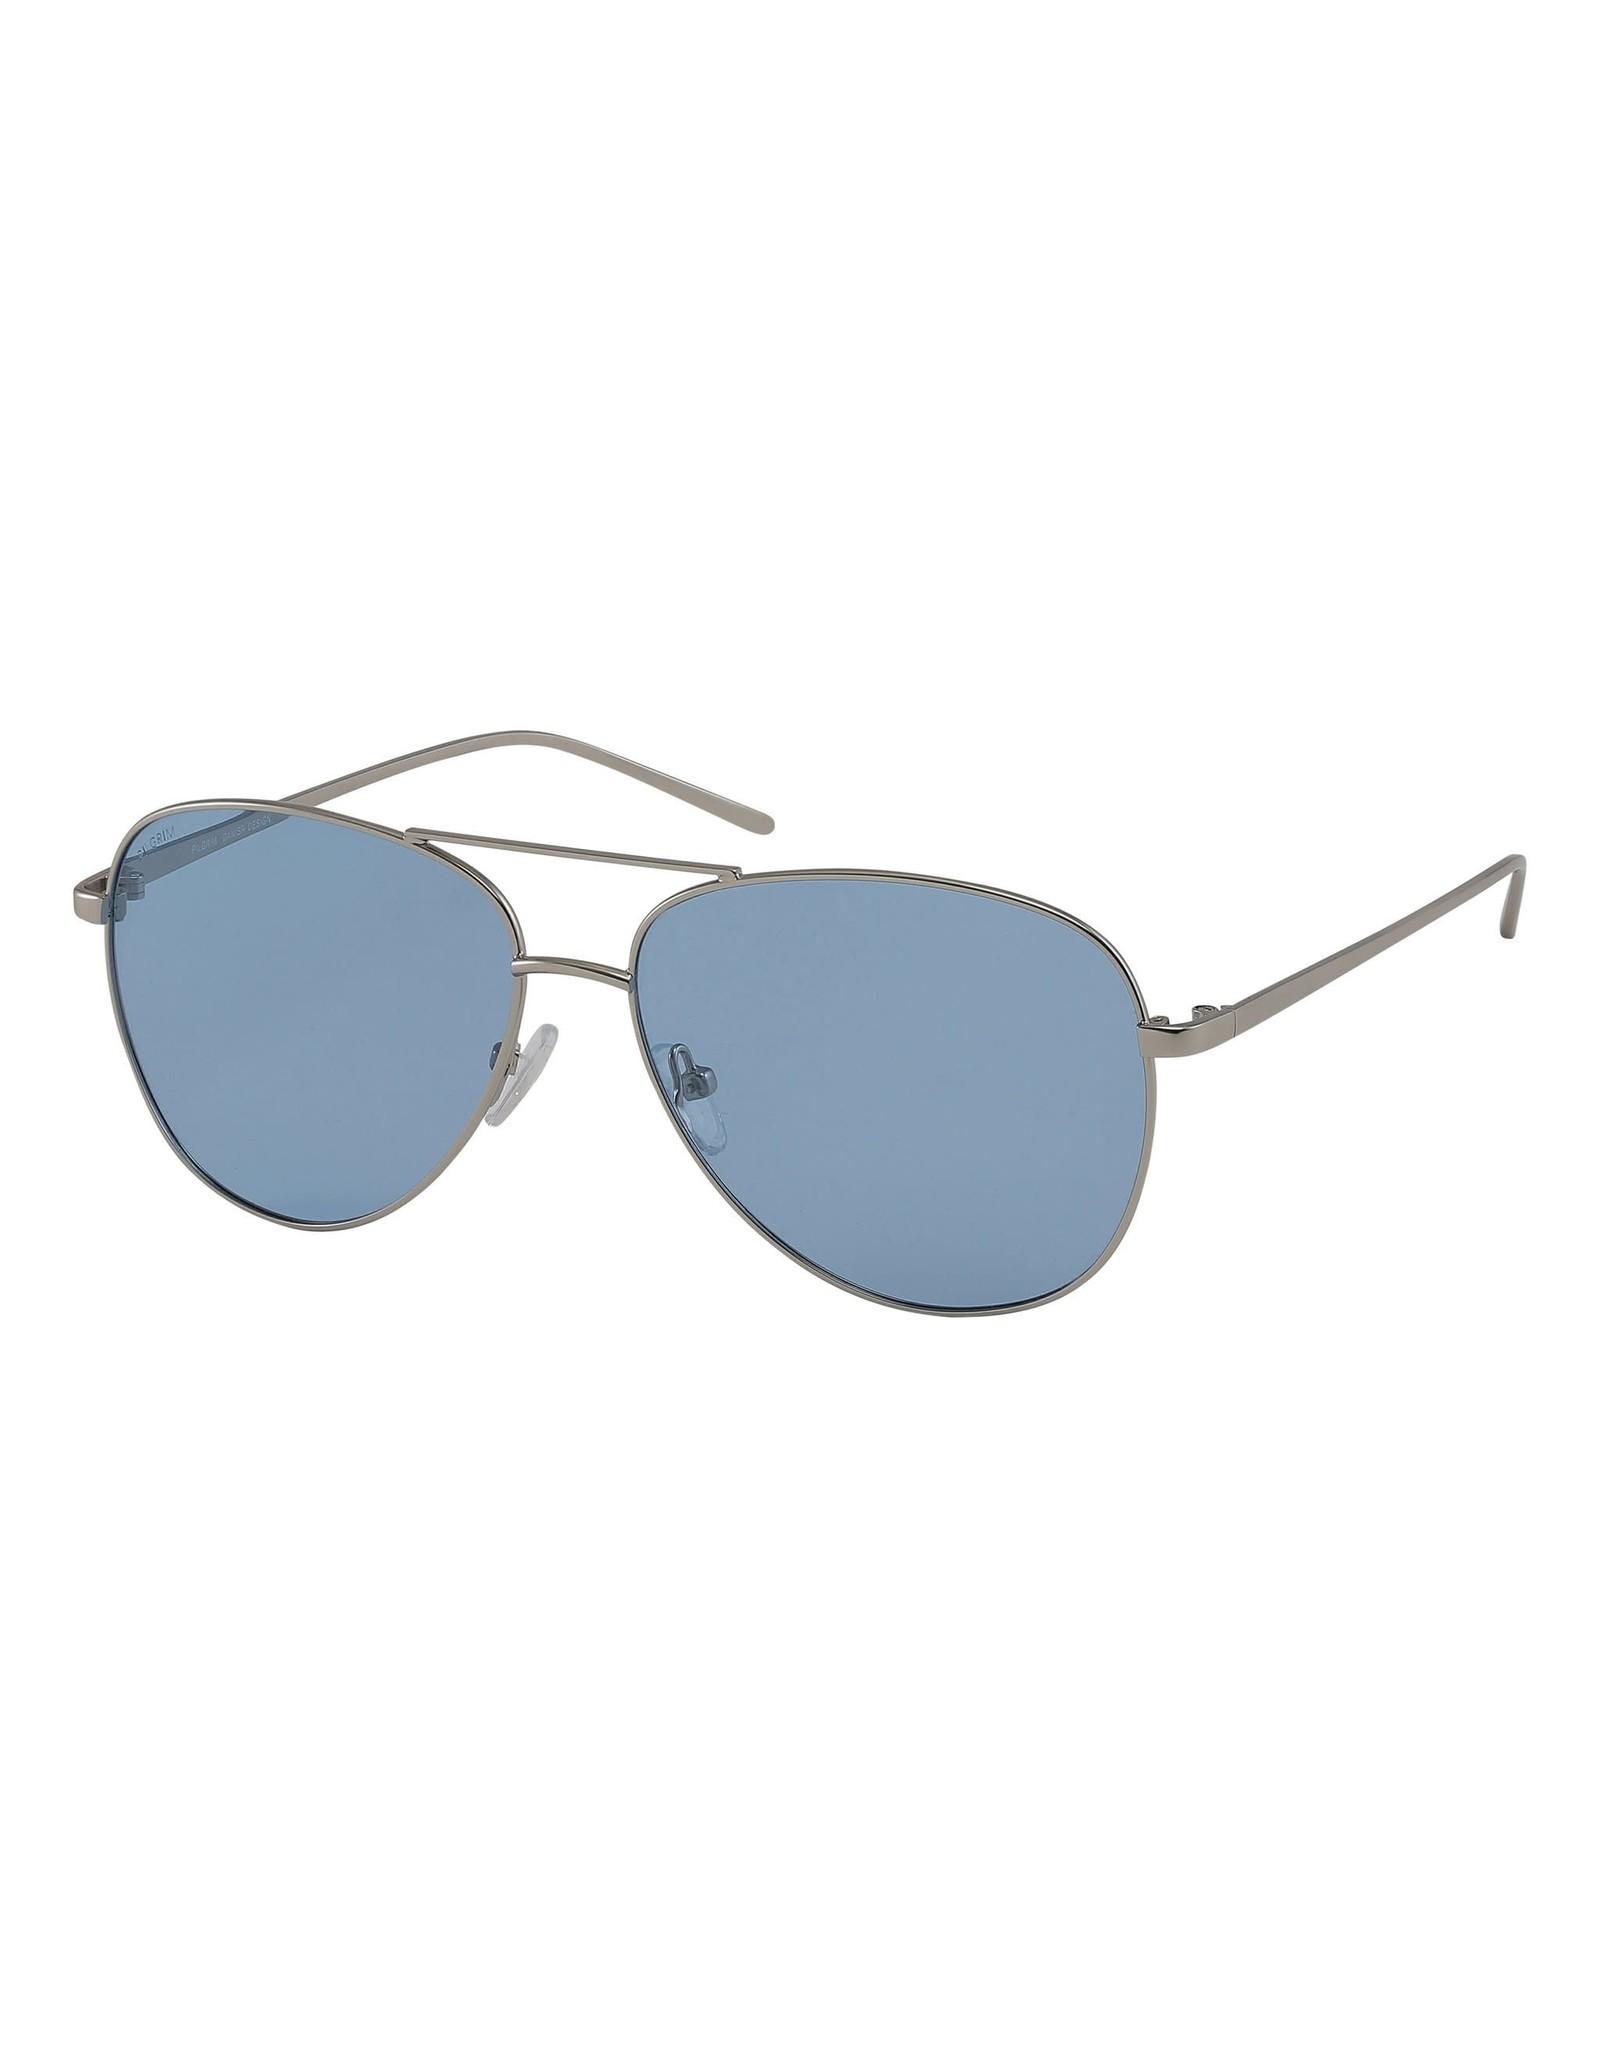 Pilgrim Pilgrim Sunglasses Nani blue